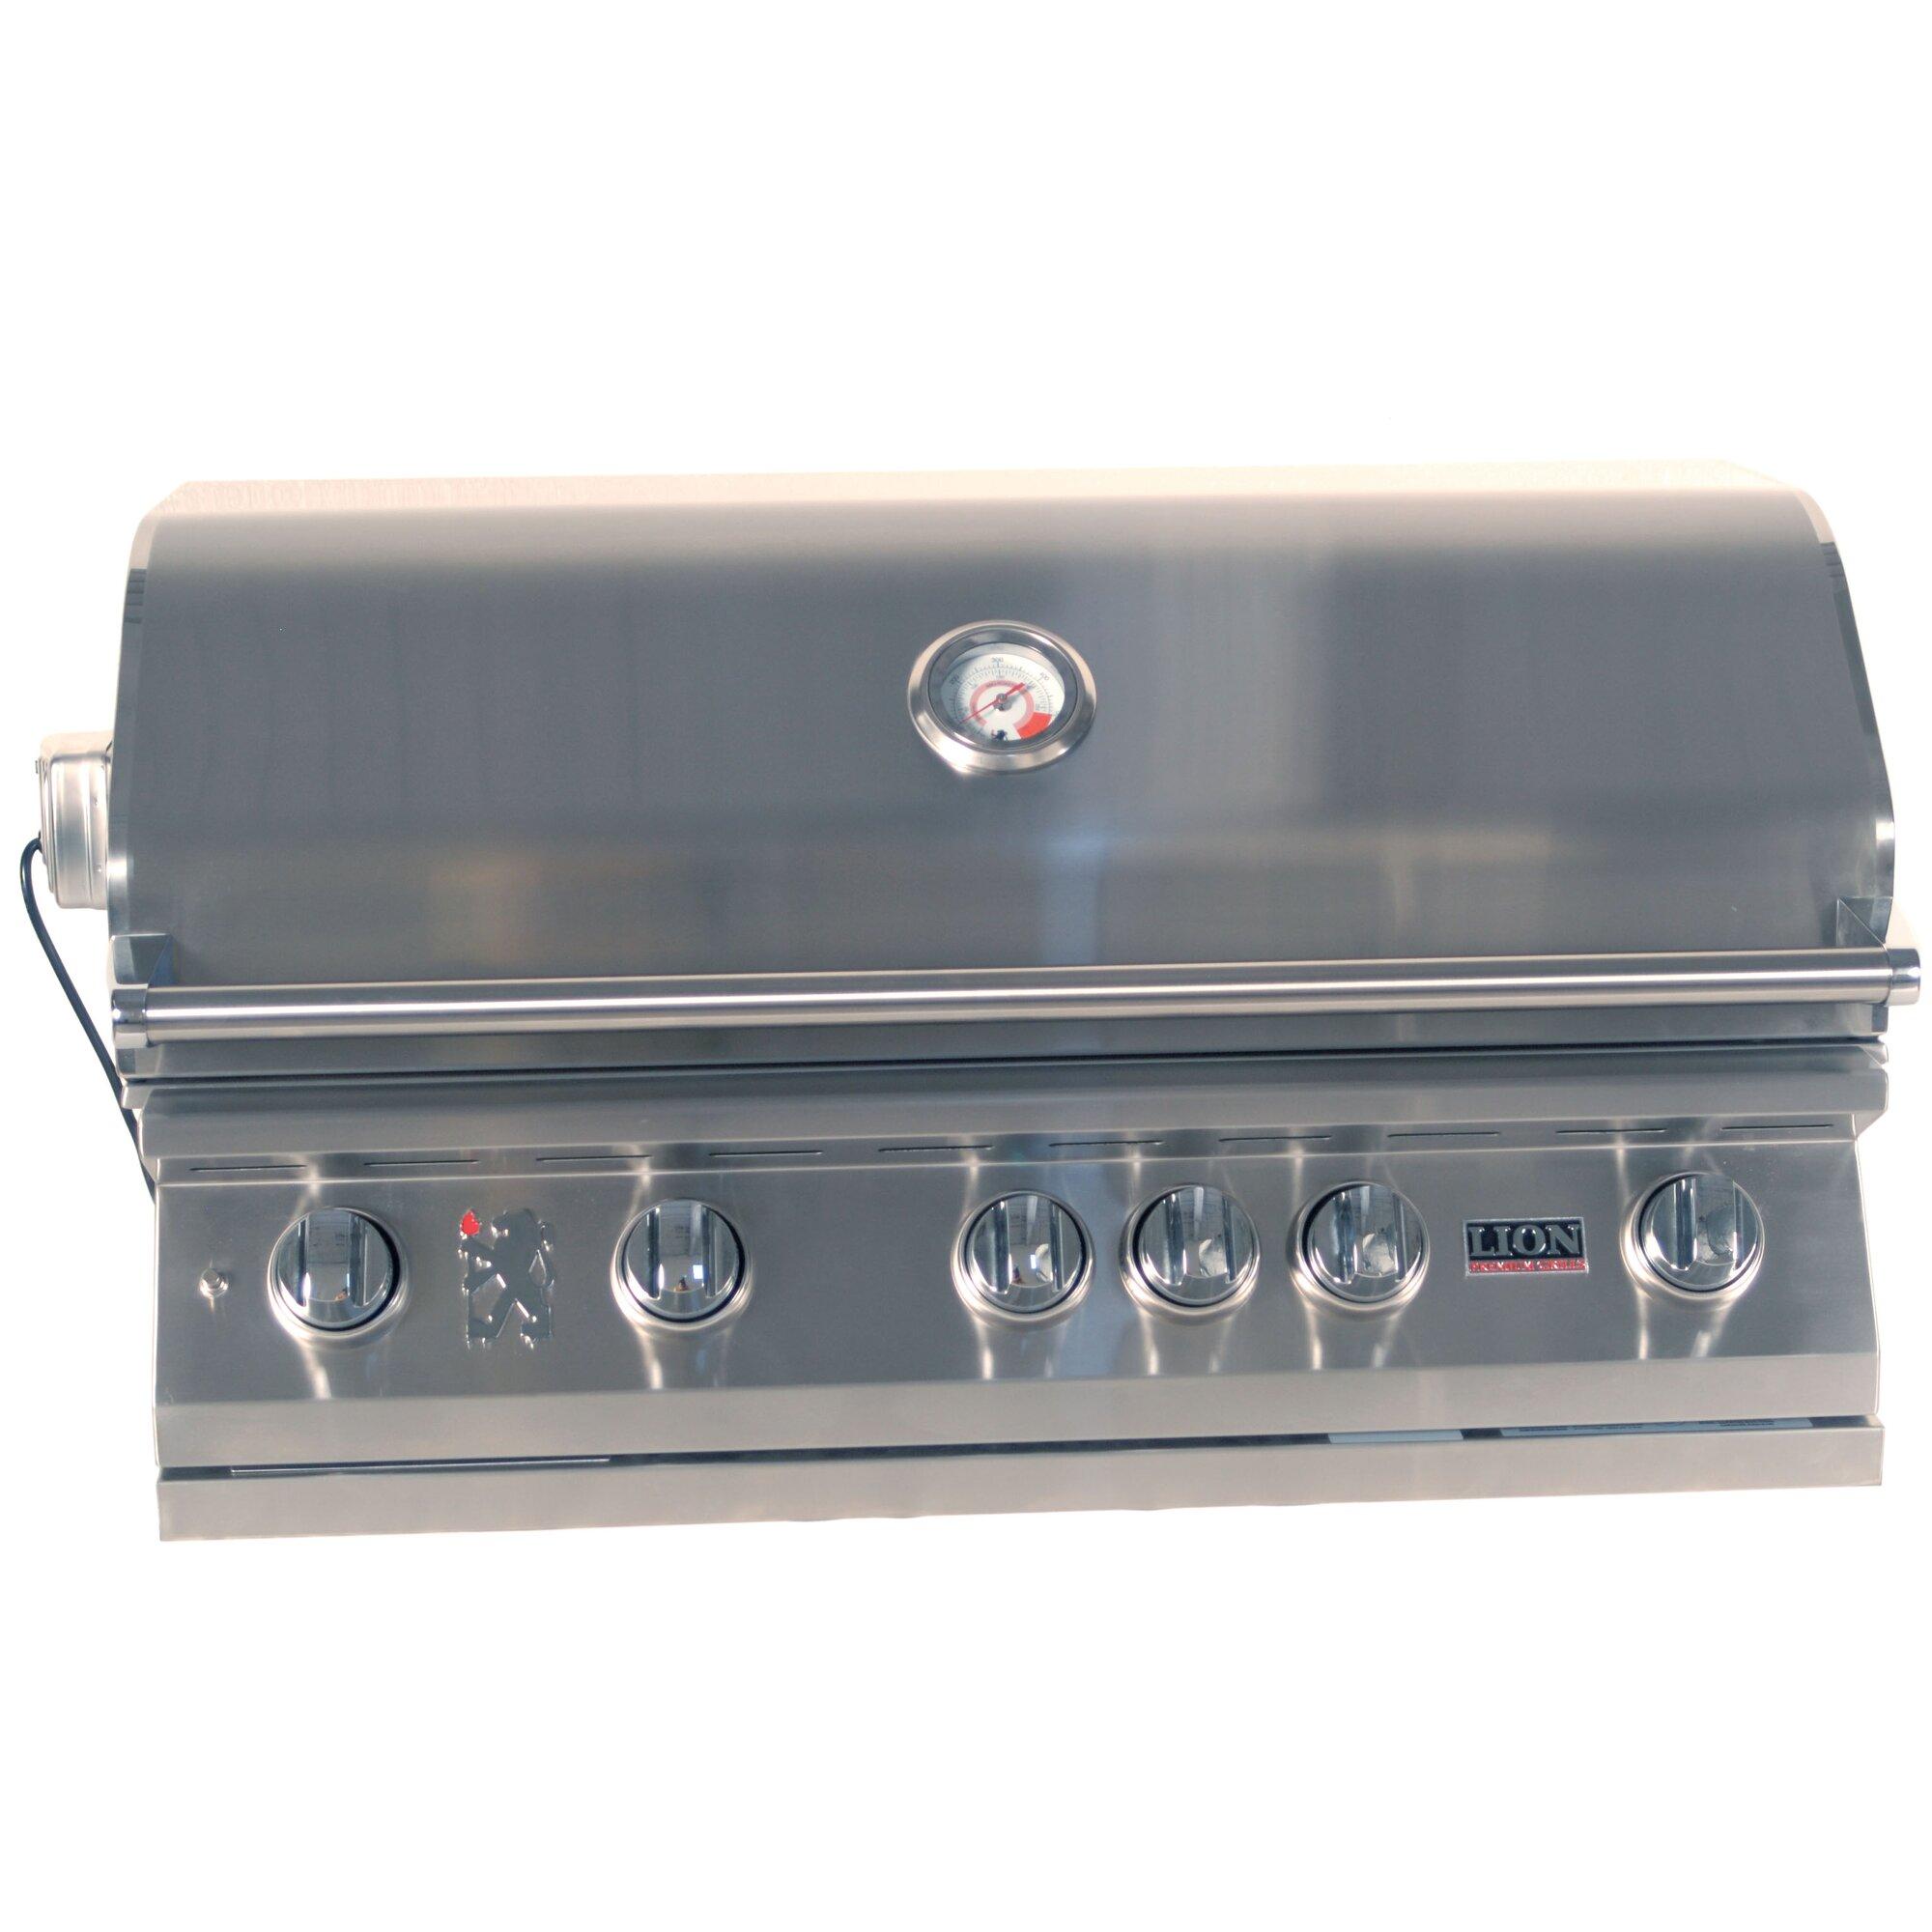 kitchenaid 2 burner model 720 0891b gas grill review. dyna glo 5 ...